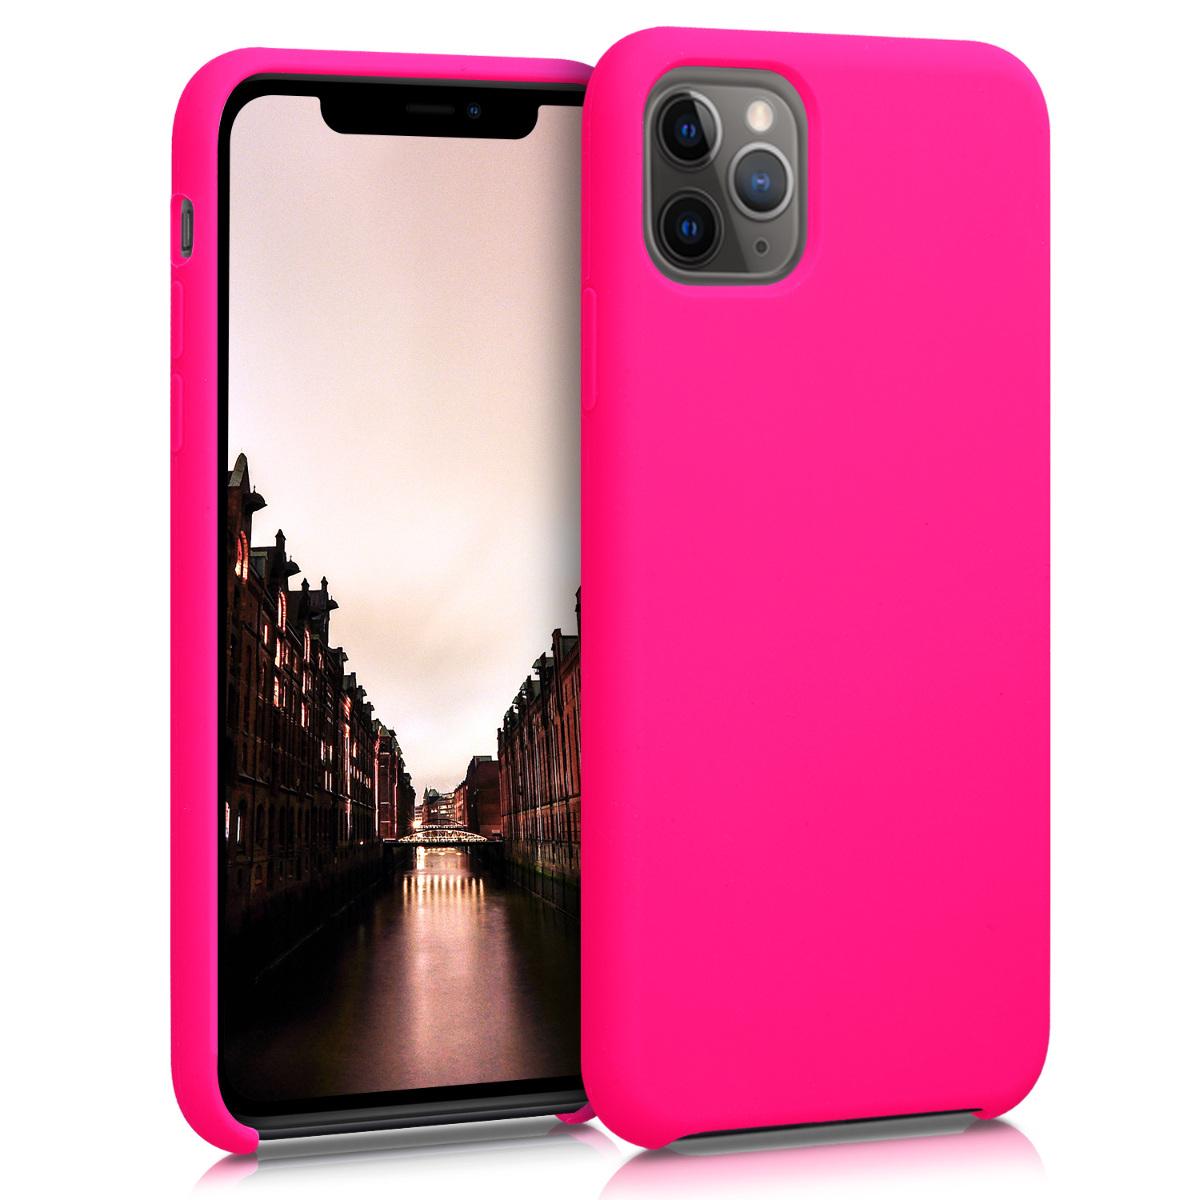 KW Θήκη Σιλικόνης Apple iPhone 11 Pro Max - Soft Flexible Rubber - Dark Pink (49725.08)